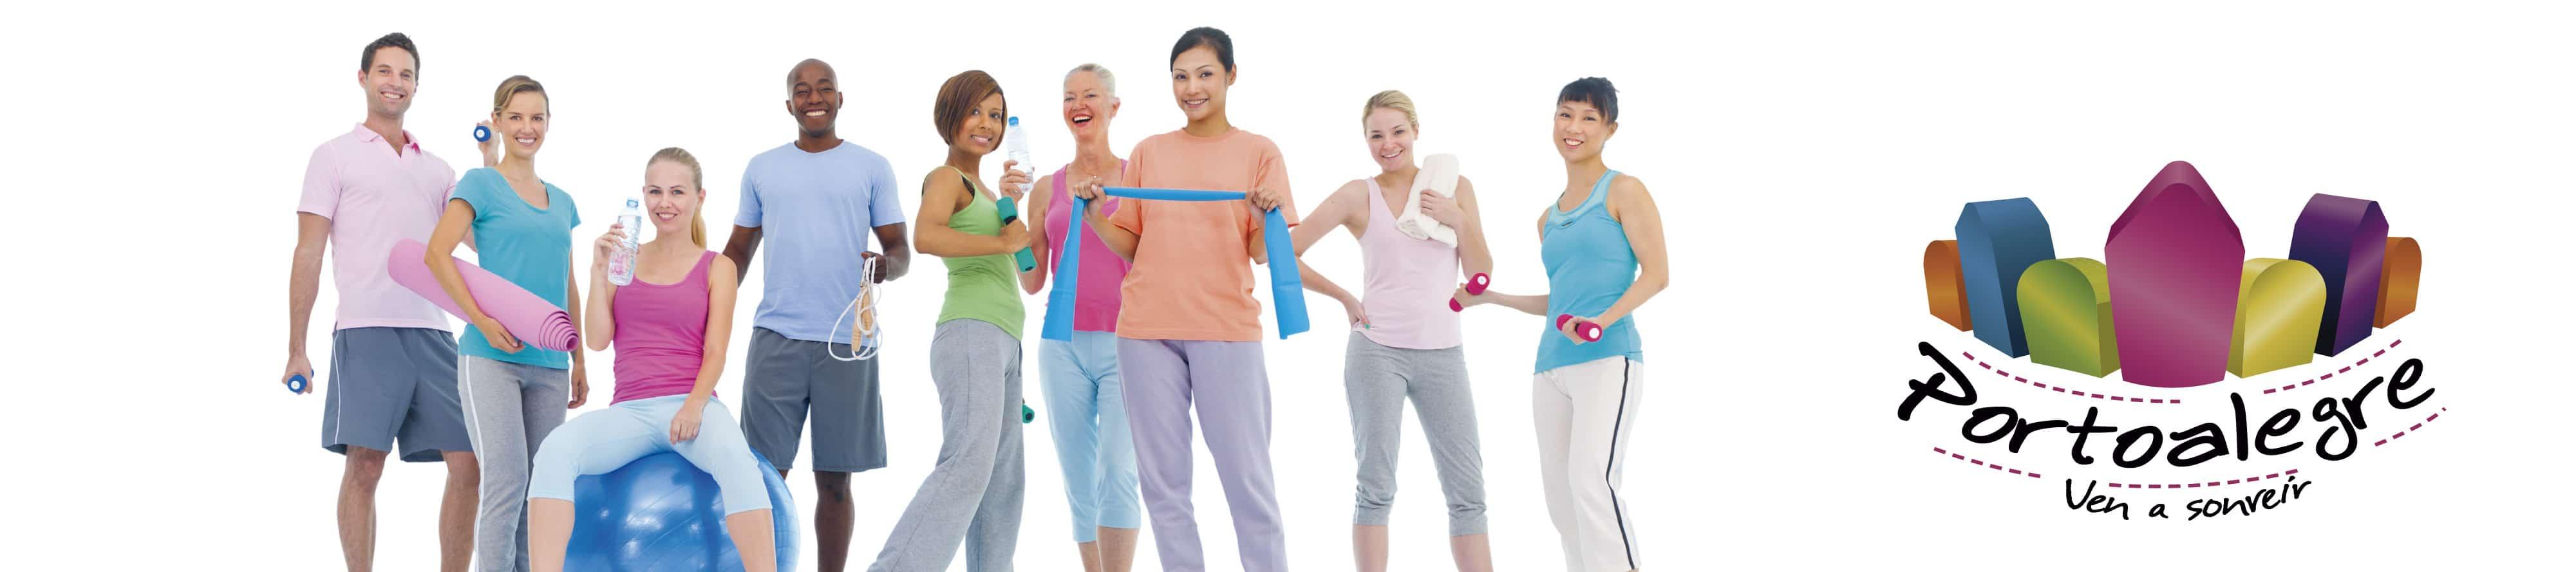 fitness club footer centro comercial portoalegre